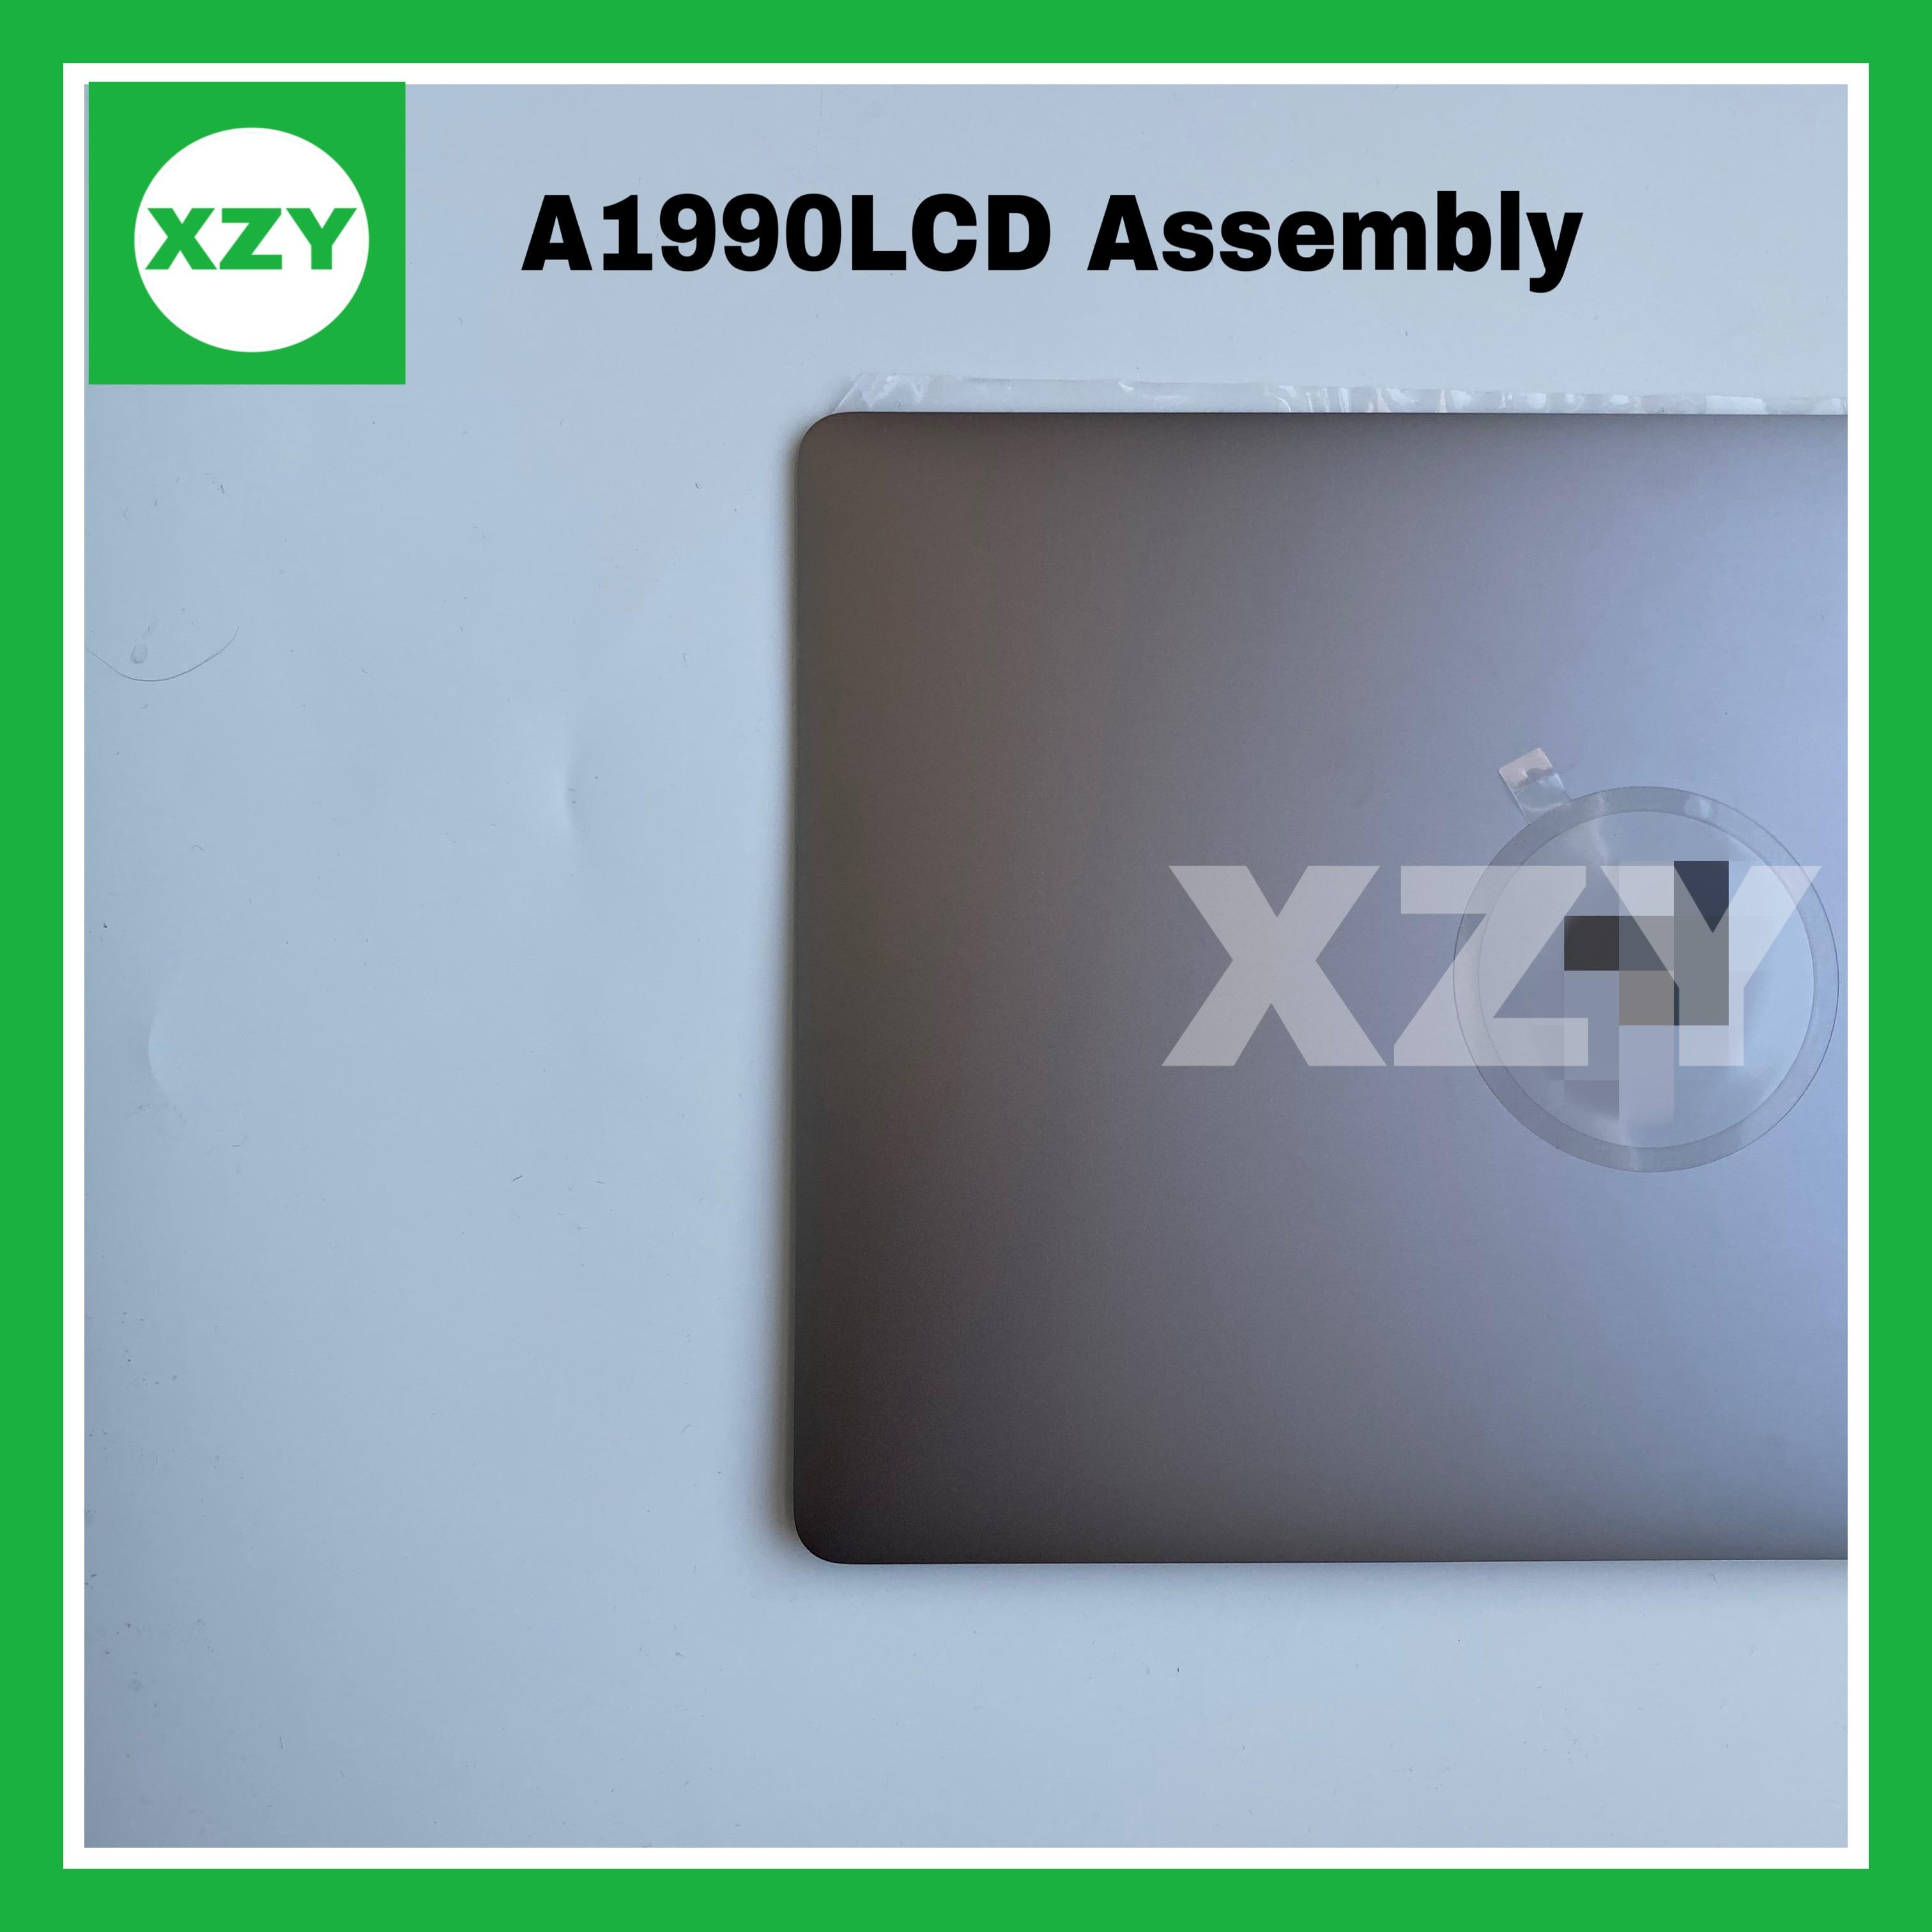 "Original novo a1990 assembléia tela lcd completo para macbook pro 15 ""a1990 meados de 2018 ano completo display lcd assembléia prata cinza"